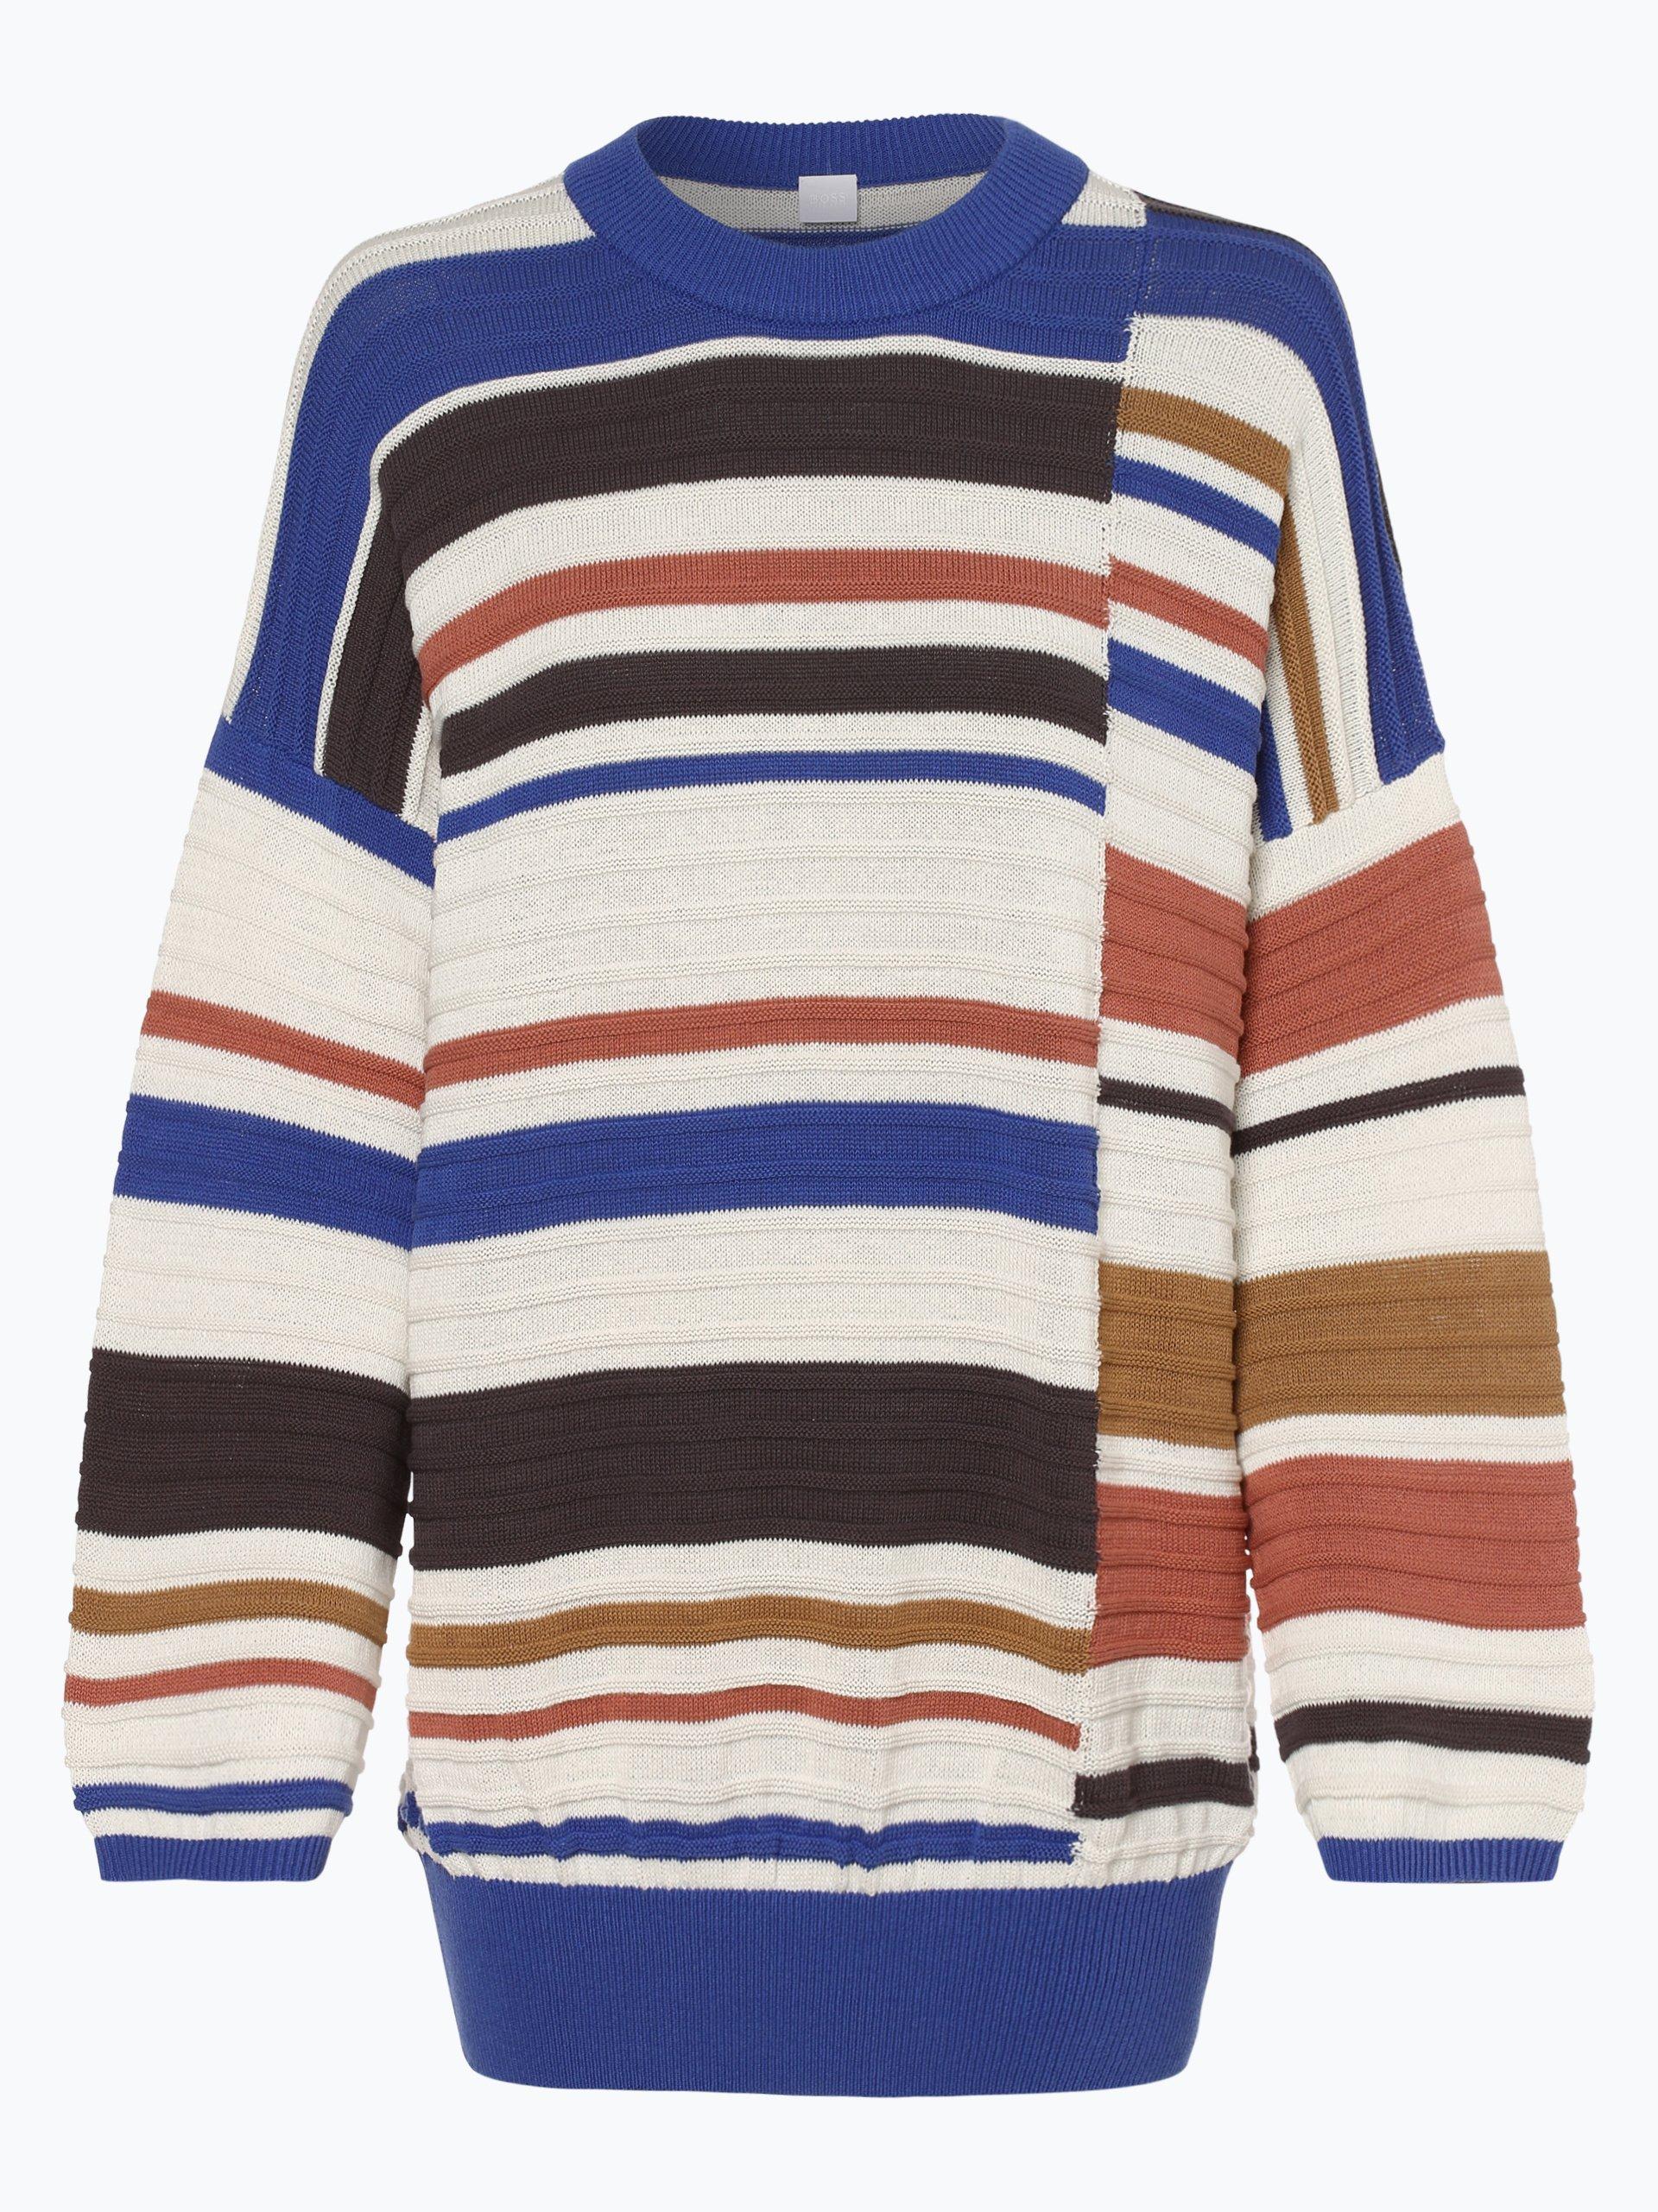 BOSS Casual Damen Pullover - Irianna